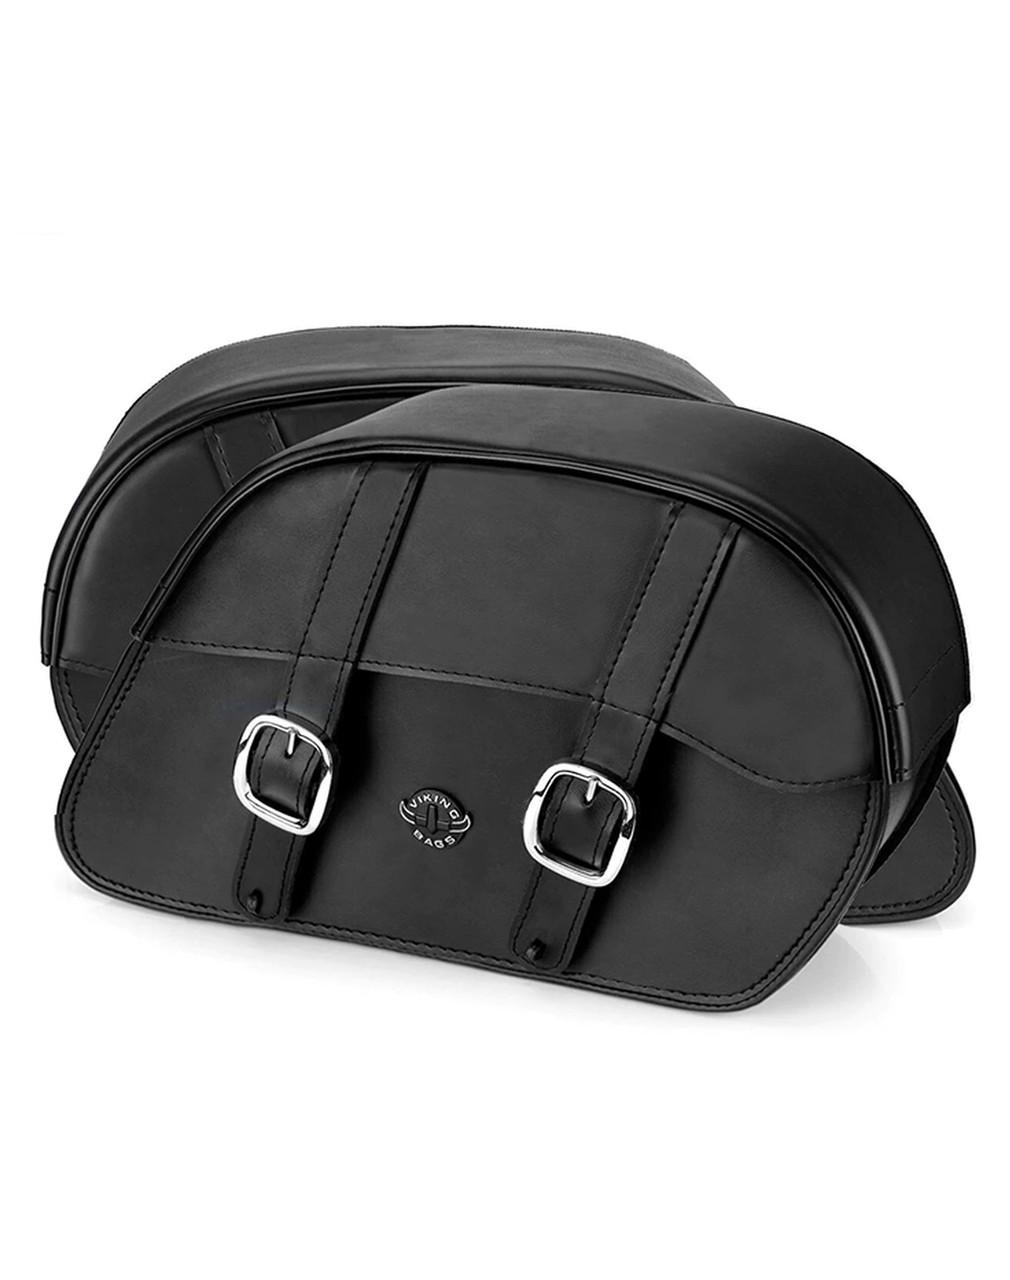 Victory Judge Slanted Large Motorcycle Saddlebags Both Bags View